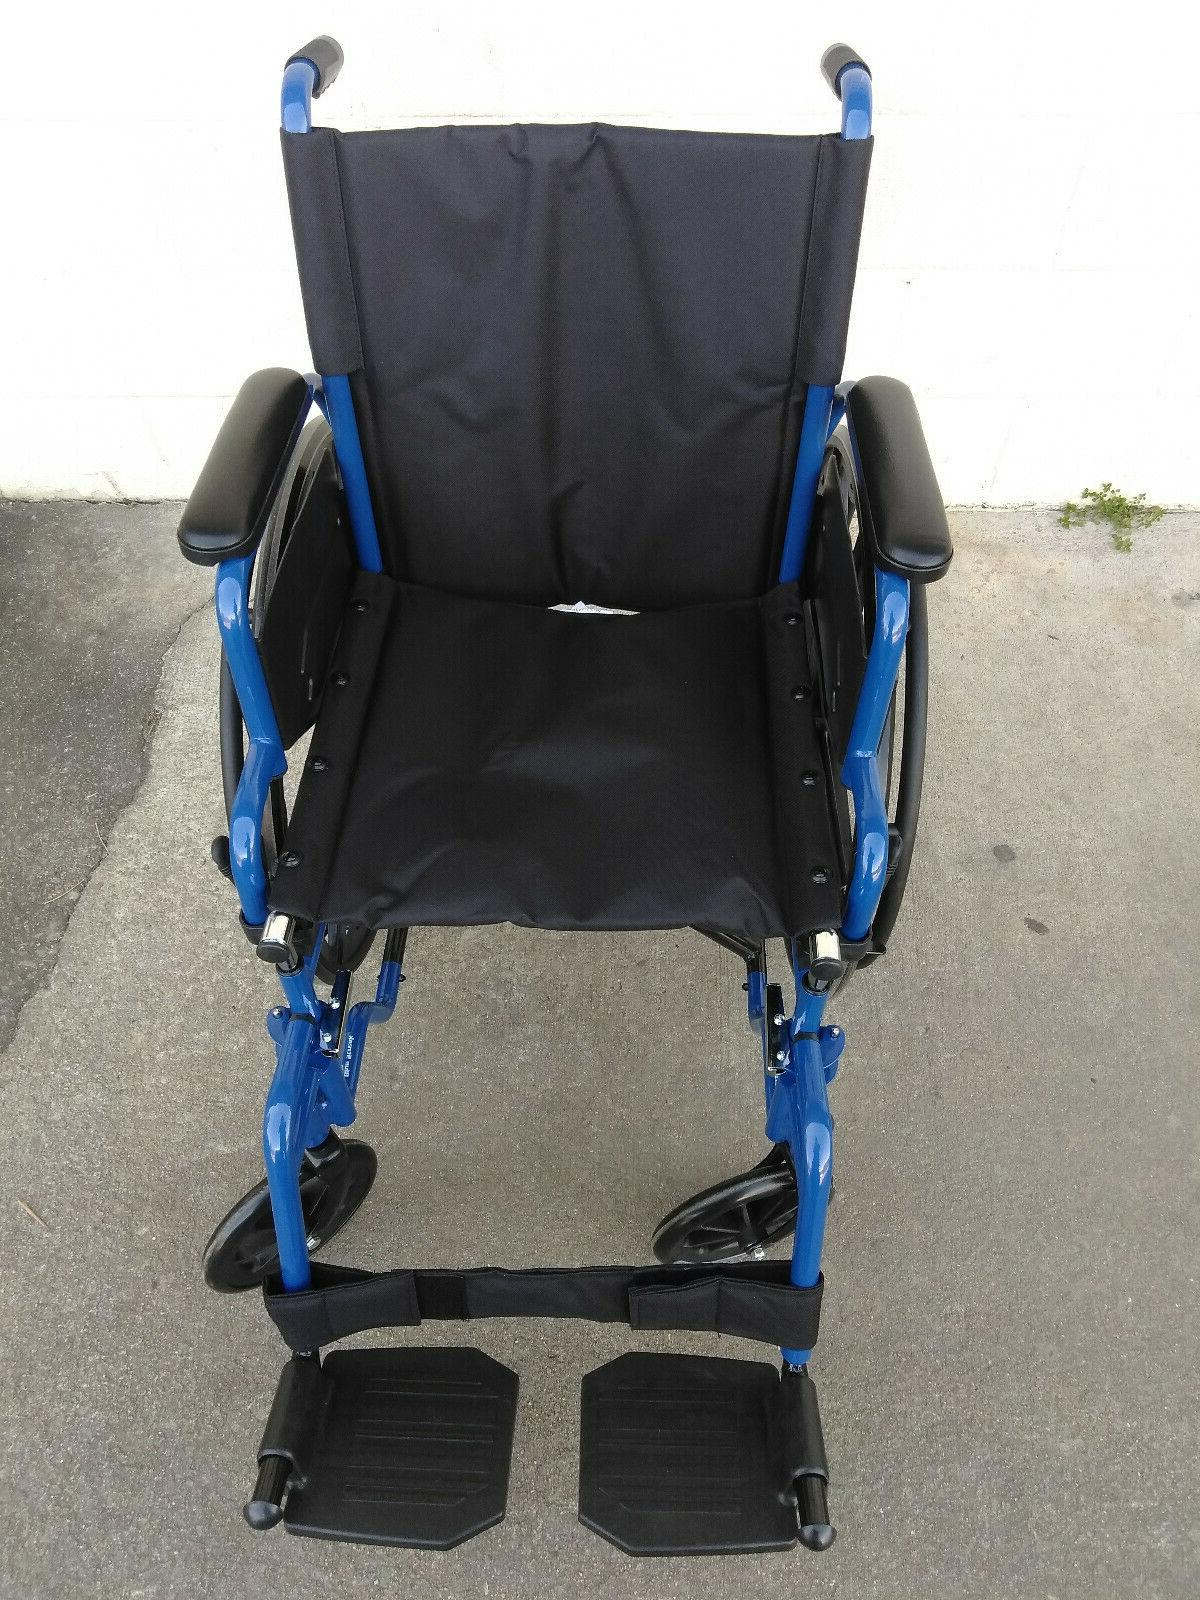 NEW Drive Streak Flip Desk Footrests, Seat